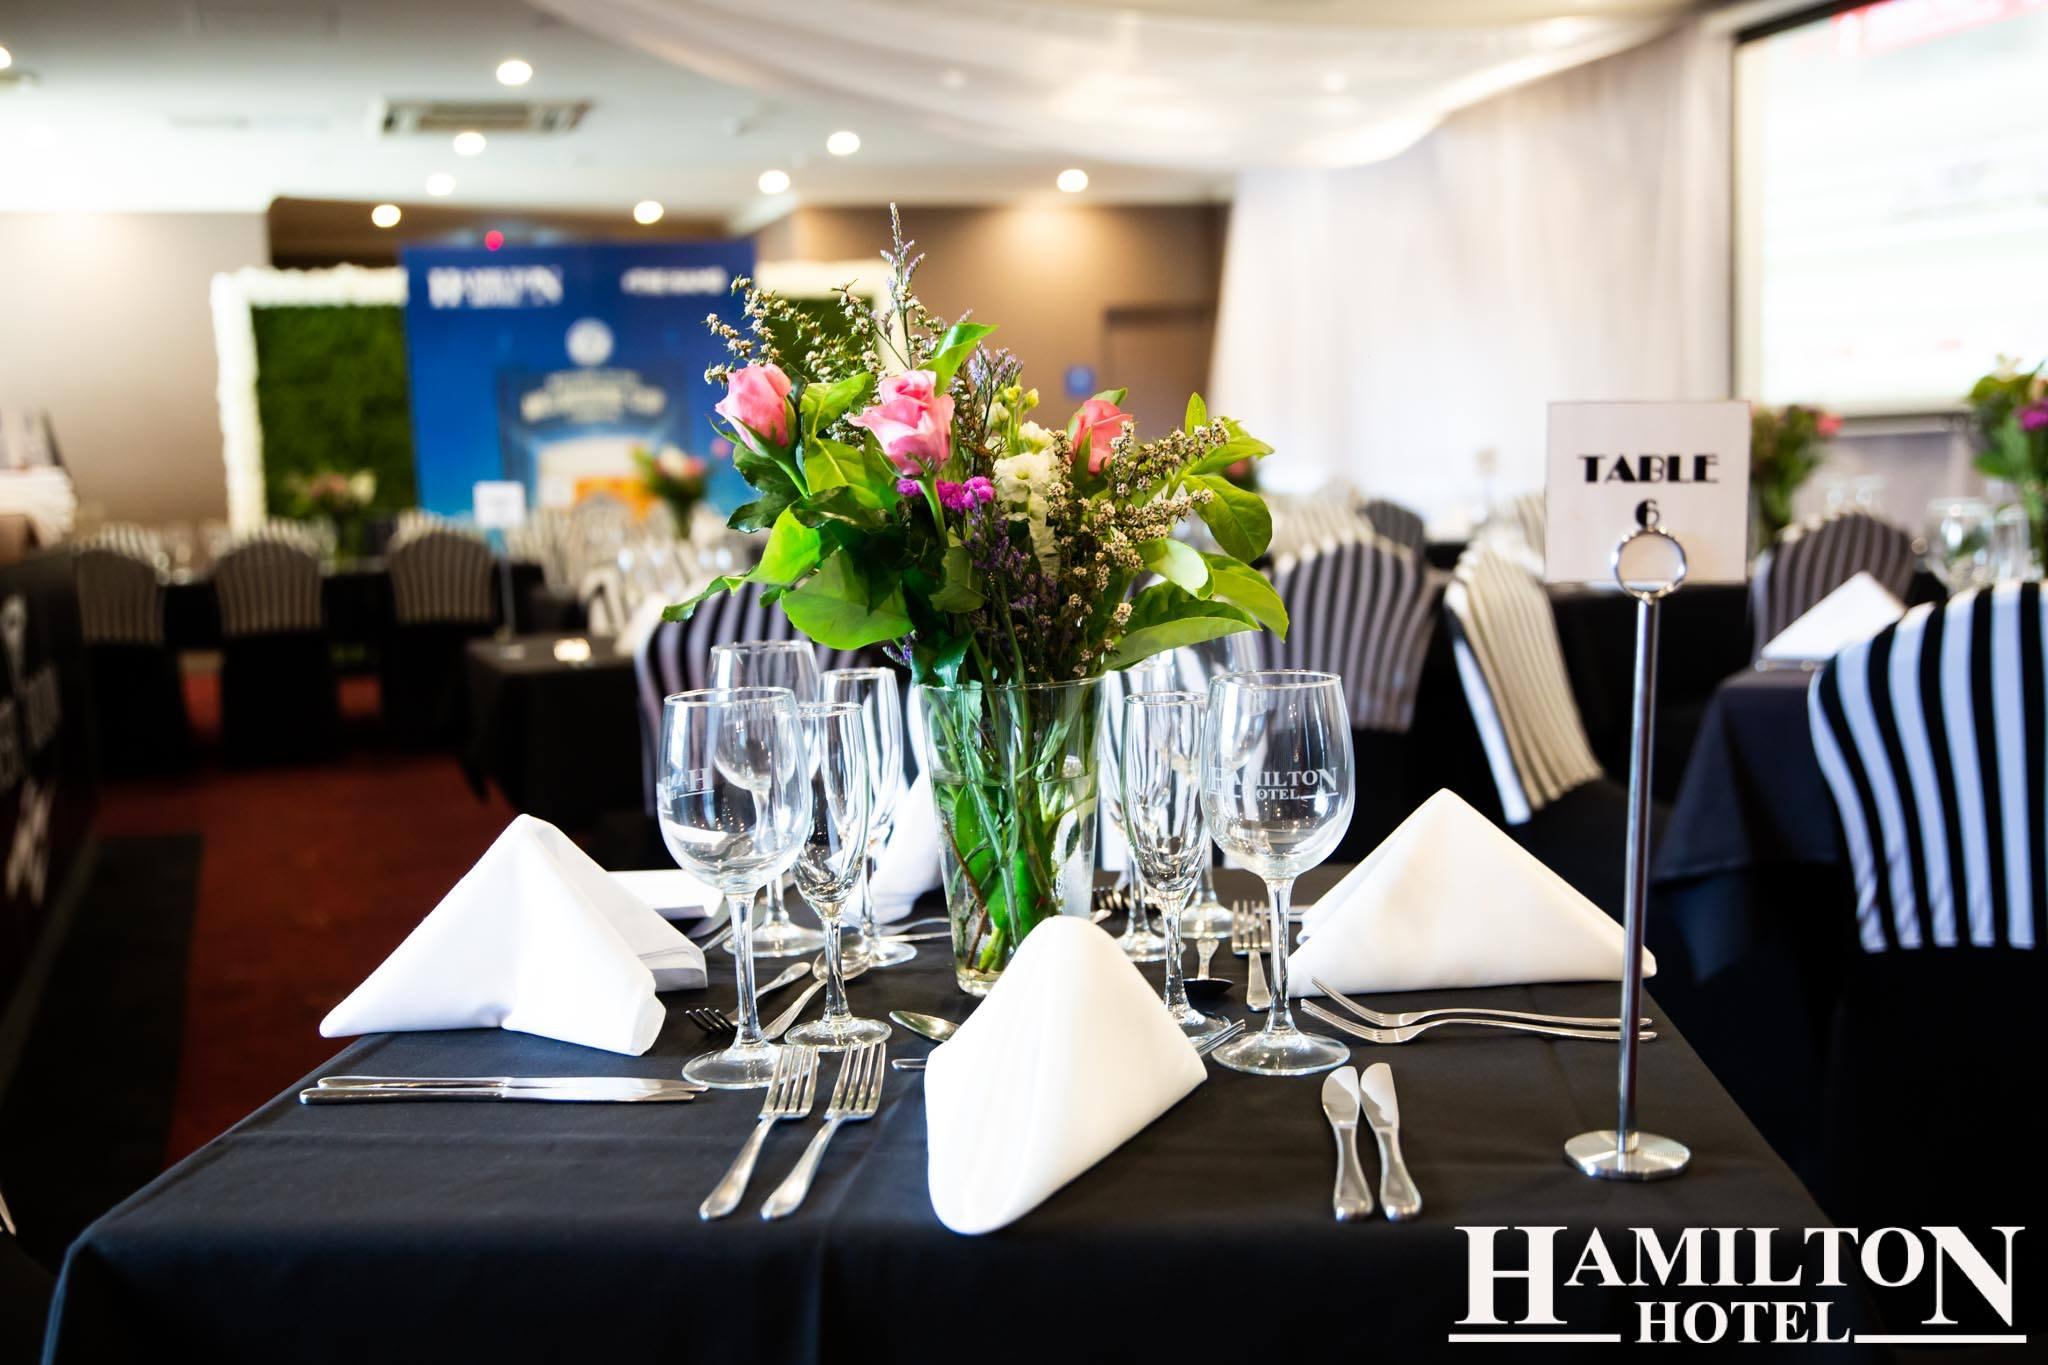 Melbourne-Cup-Hamilton-Hotel-Hamilton,QLD (6).jpg